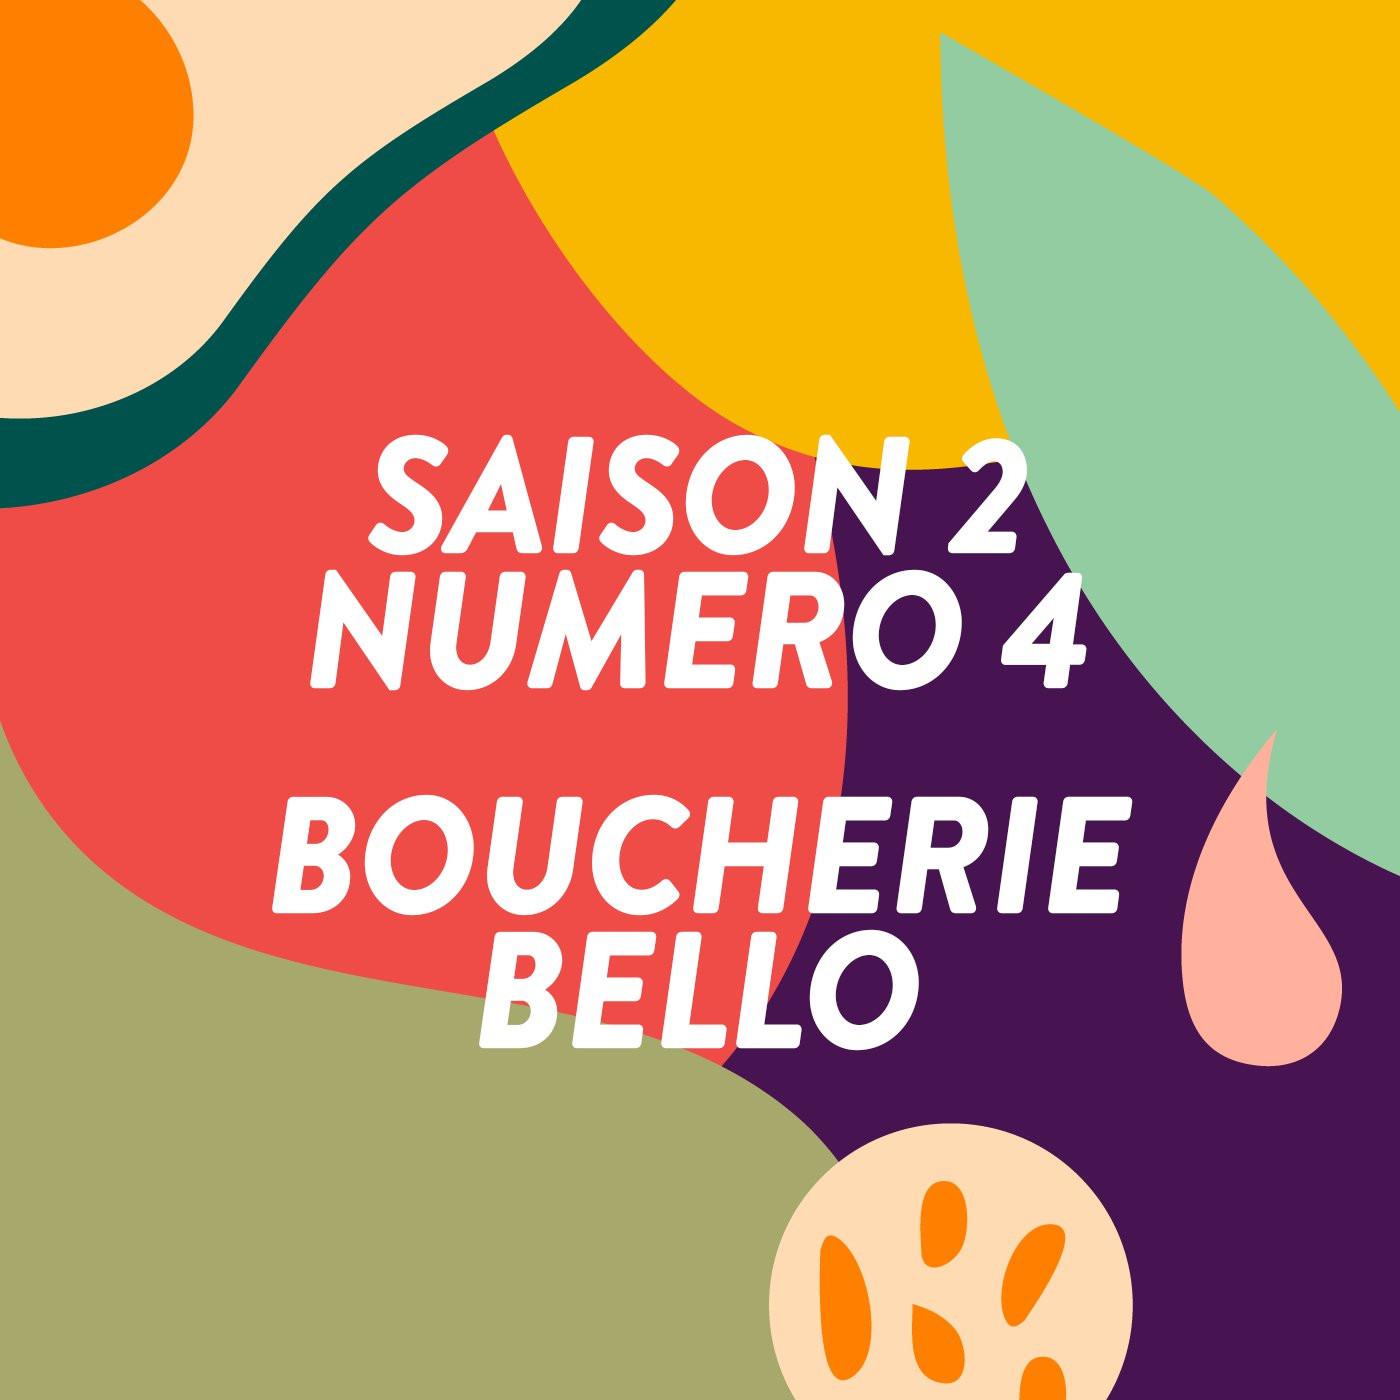 Boucherie Bello / #4 S2